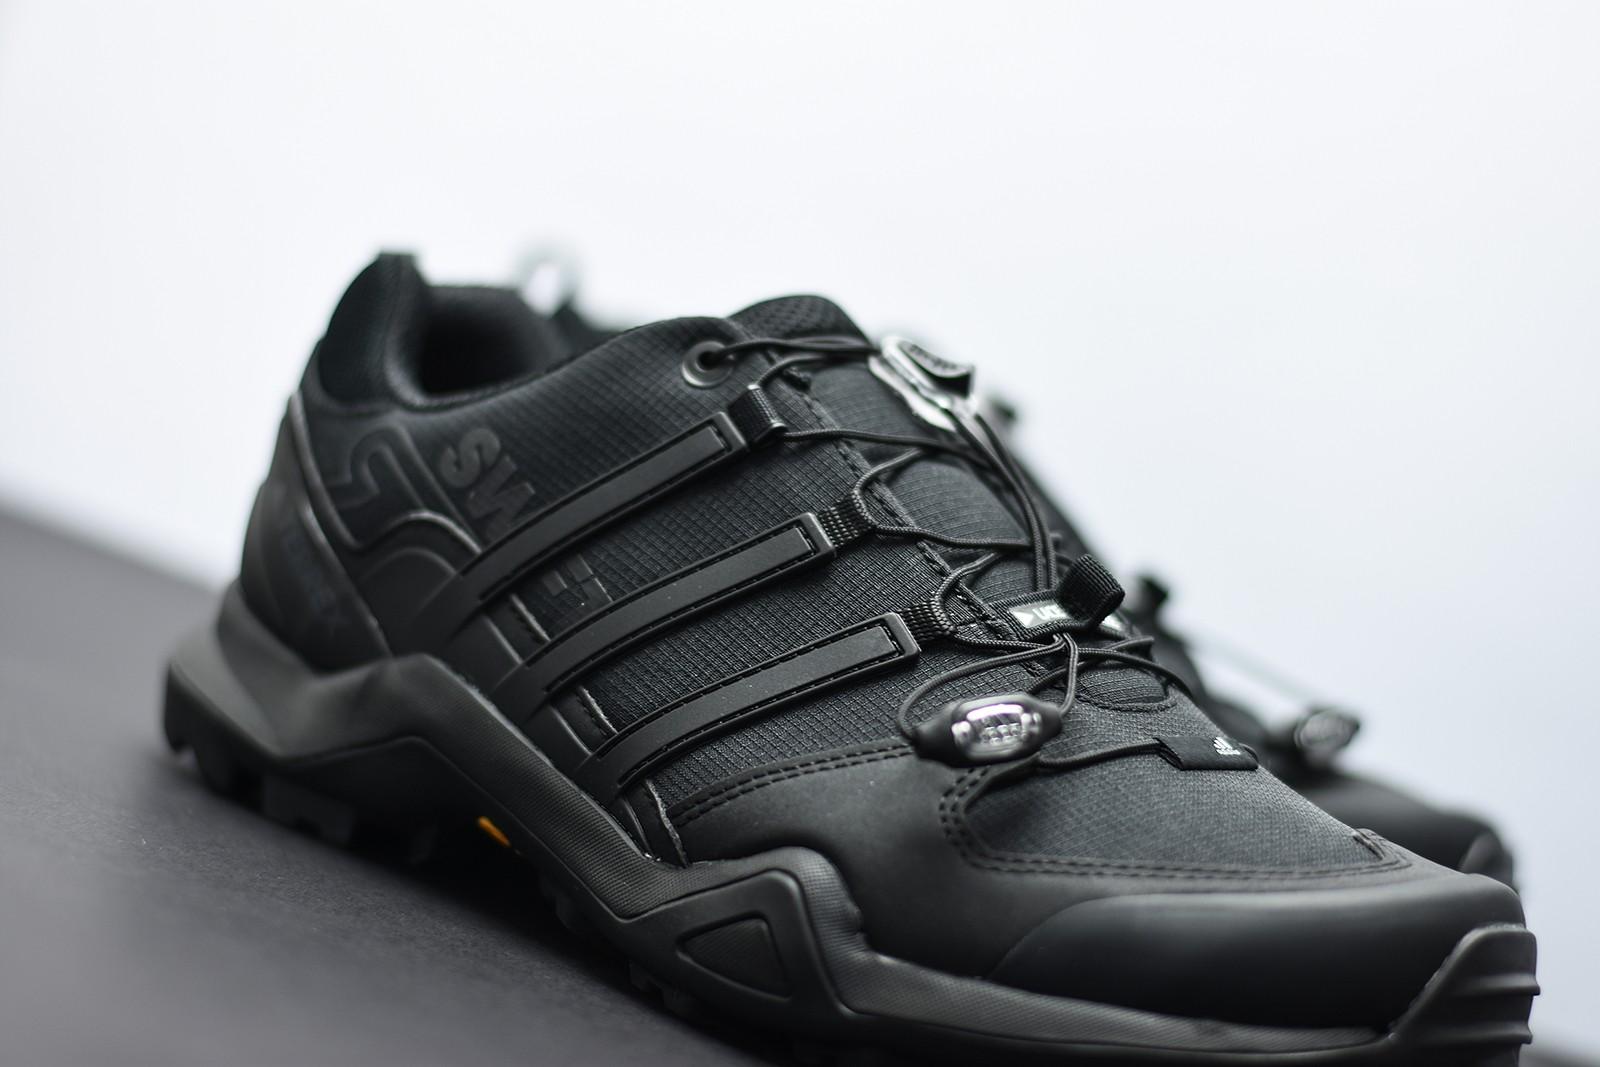 f6d863c9549 Pánská treková obuv adidas Performance TERREX SWIFT R2